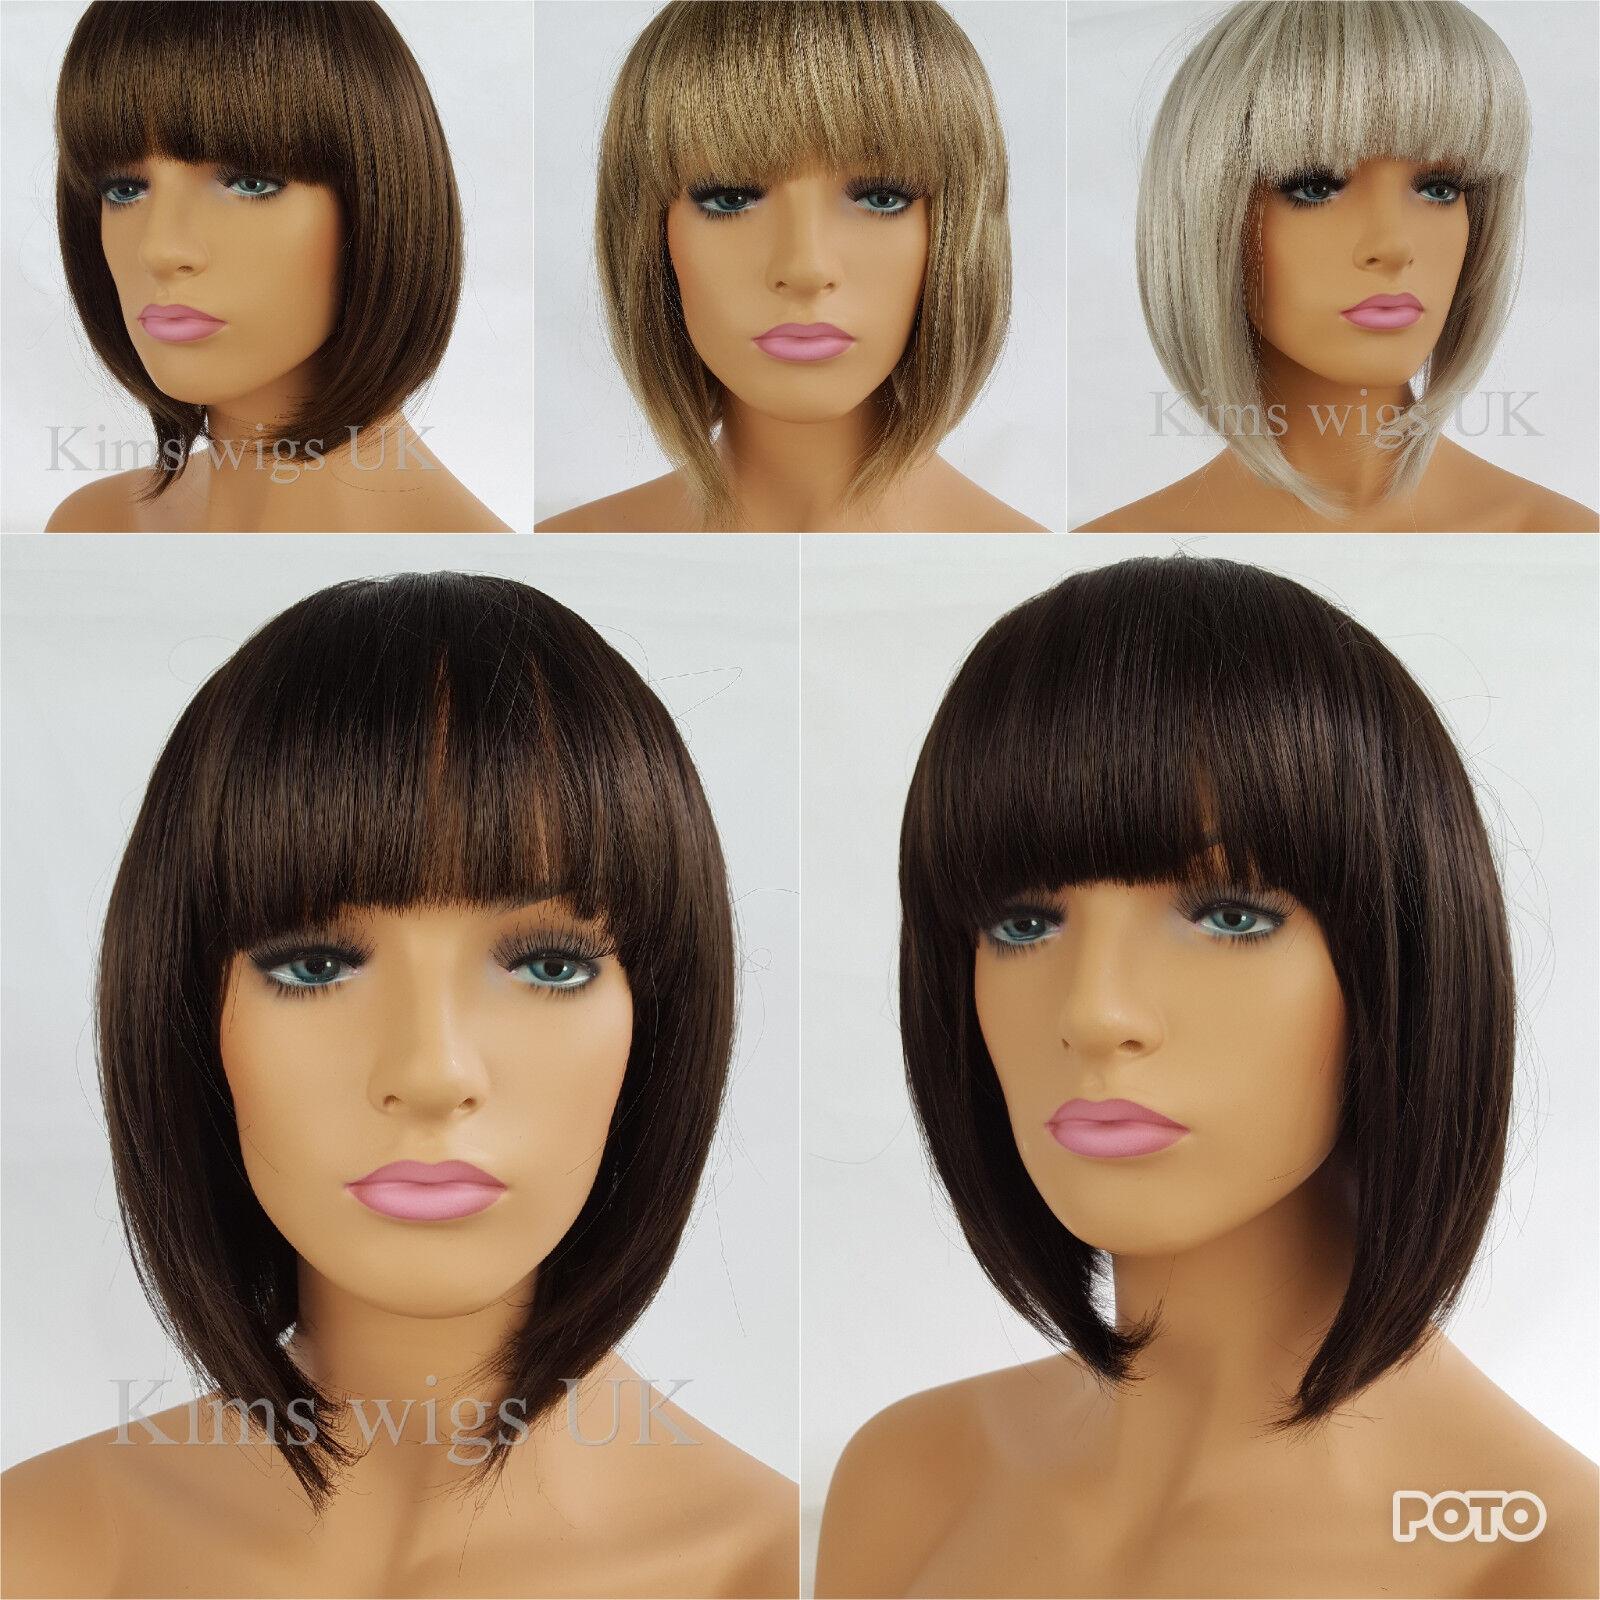 Details Zu Ladies Bob Wig Womens Short Style Brown Blonde Black Silver Grey B38 Uk Seller